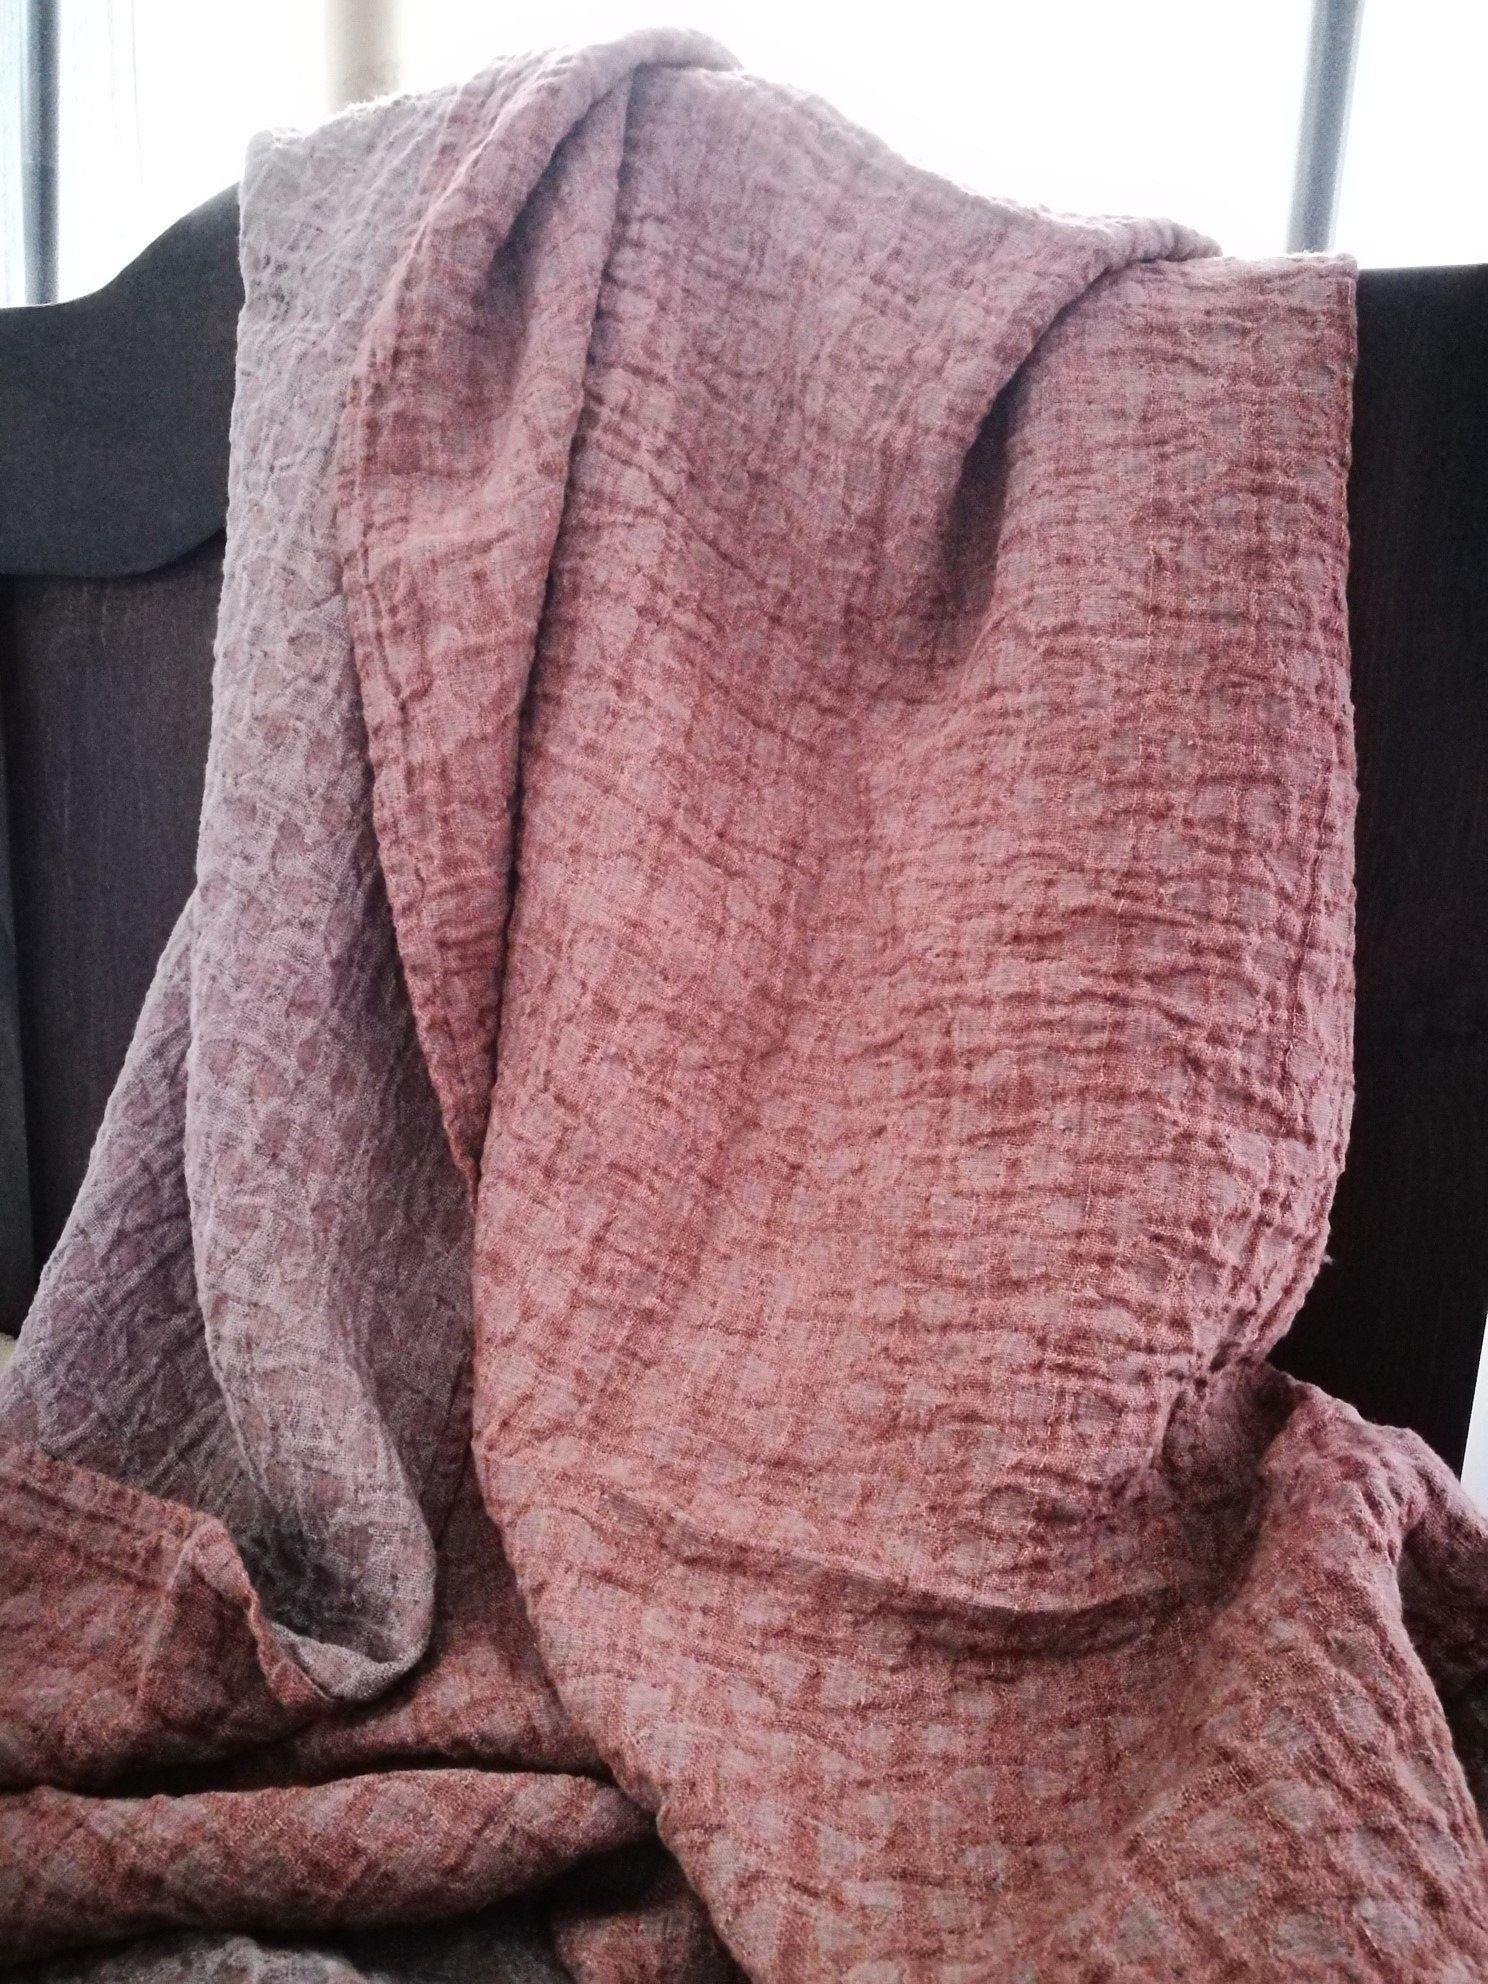 Linen Blanket Dark Pink Throw Natural Home Decor